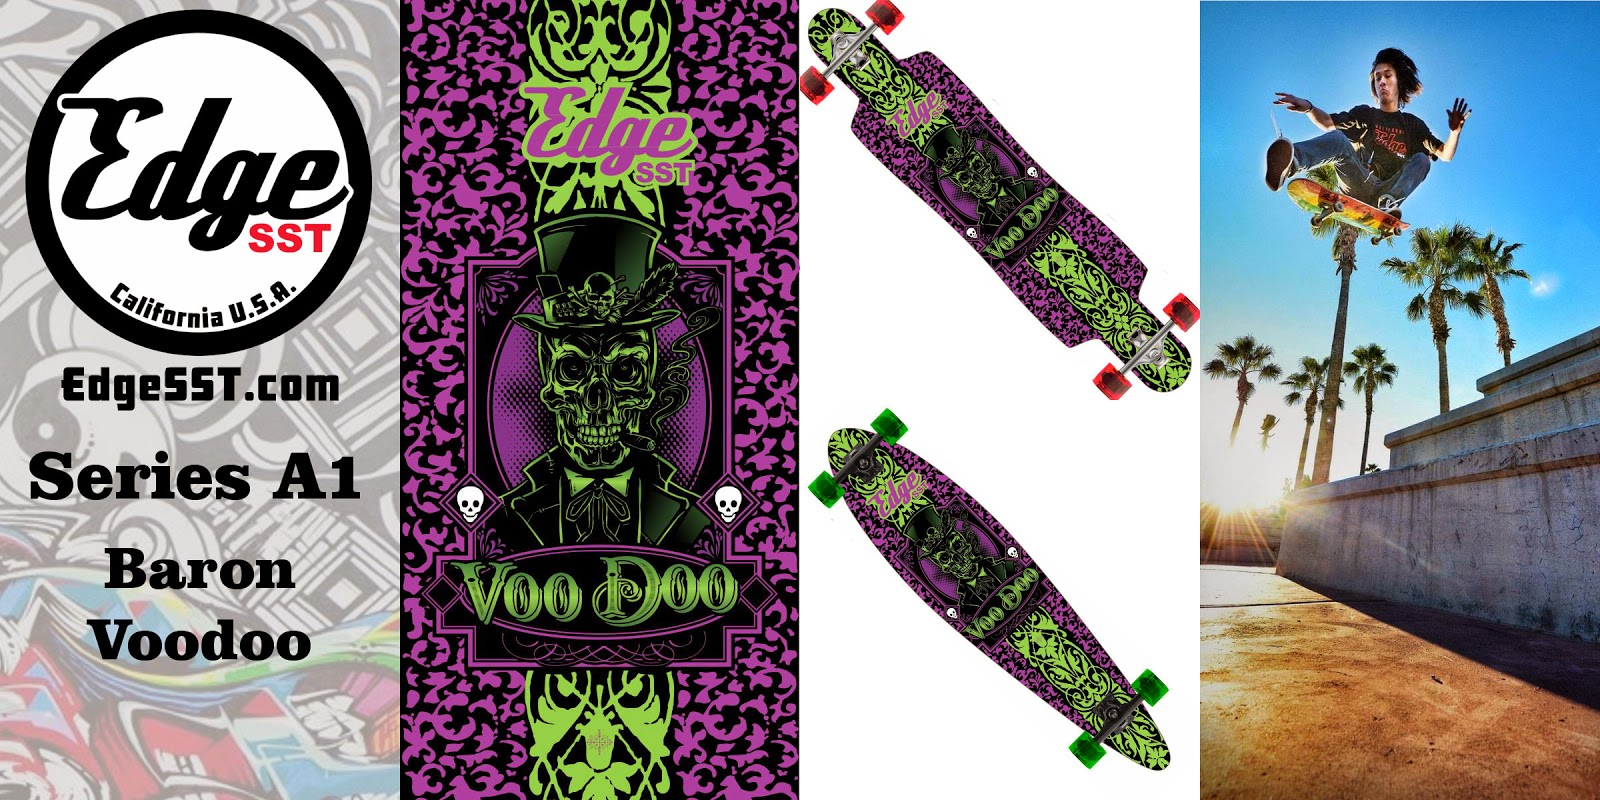 Edge SST Skateboard Series A1: Baron Voodoo Skateboard